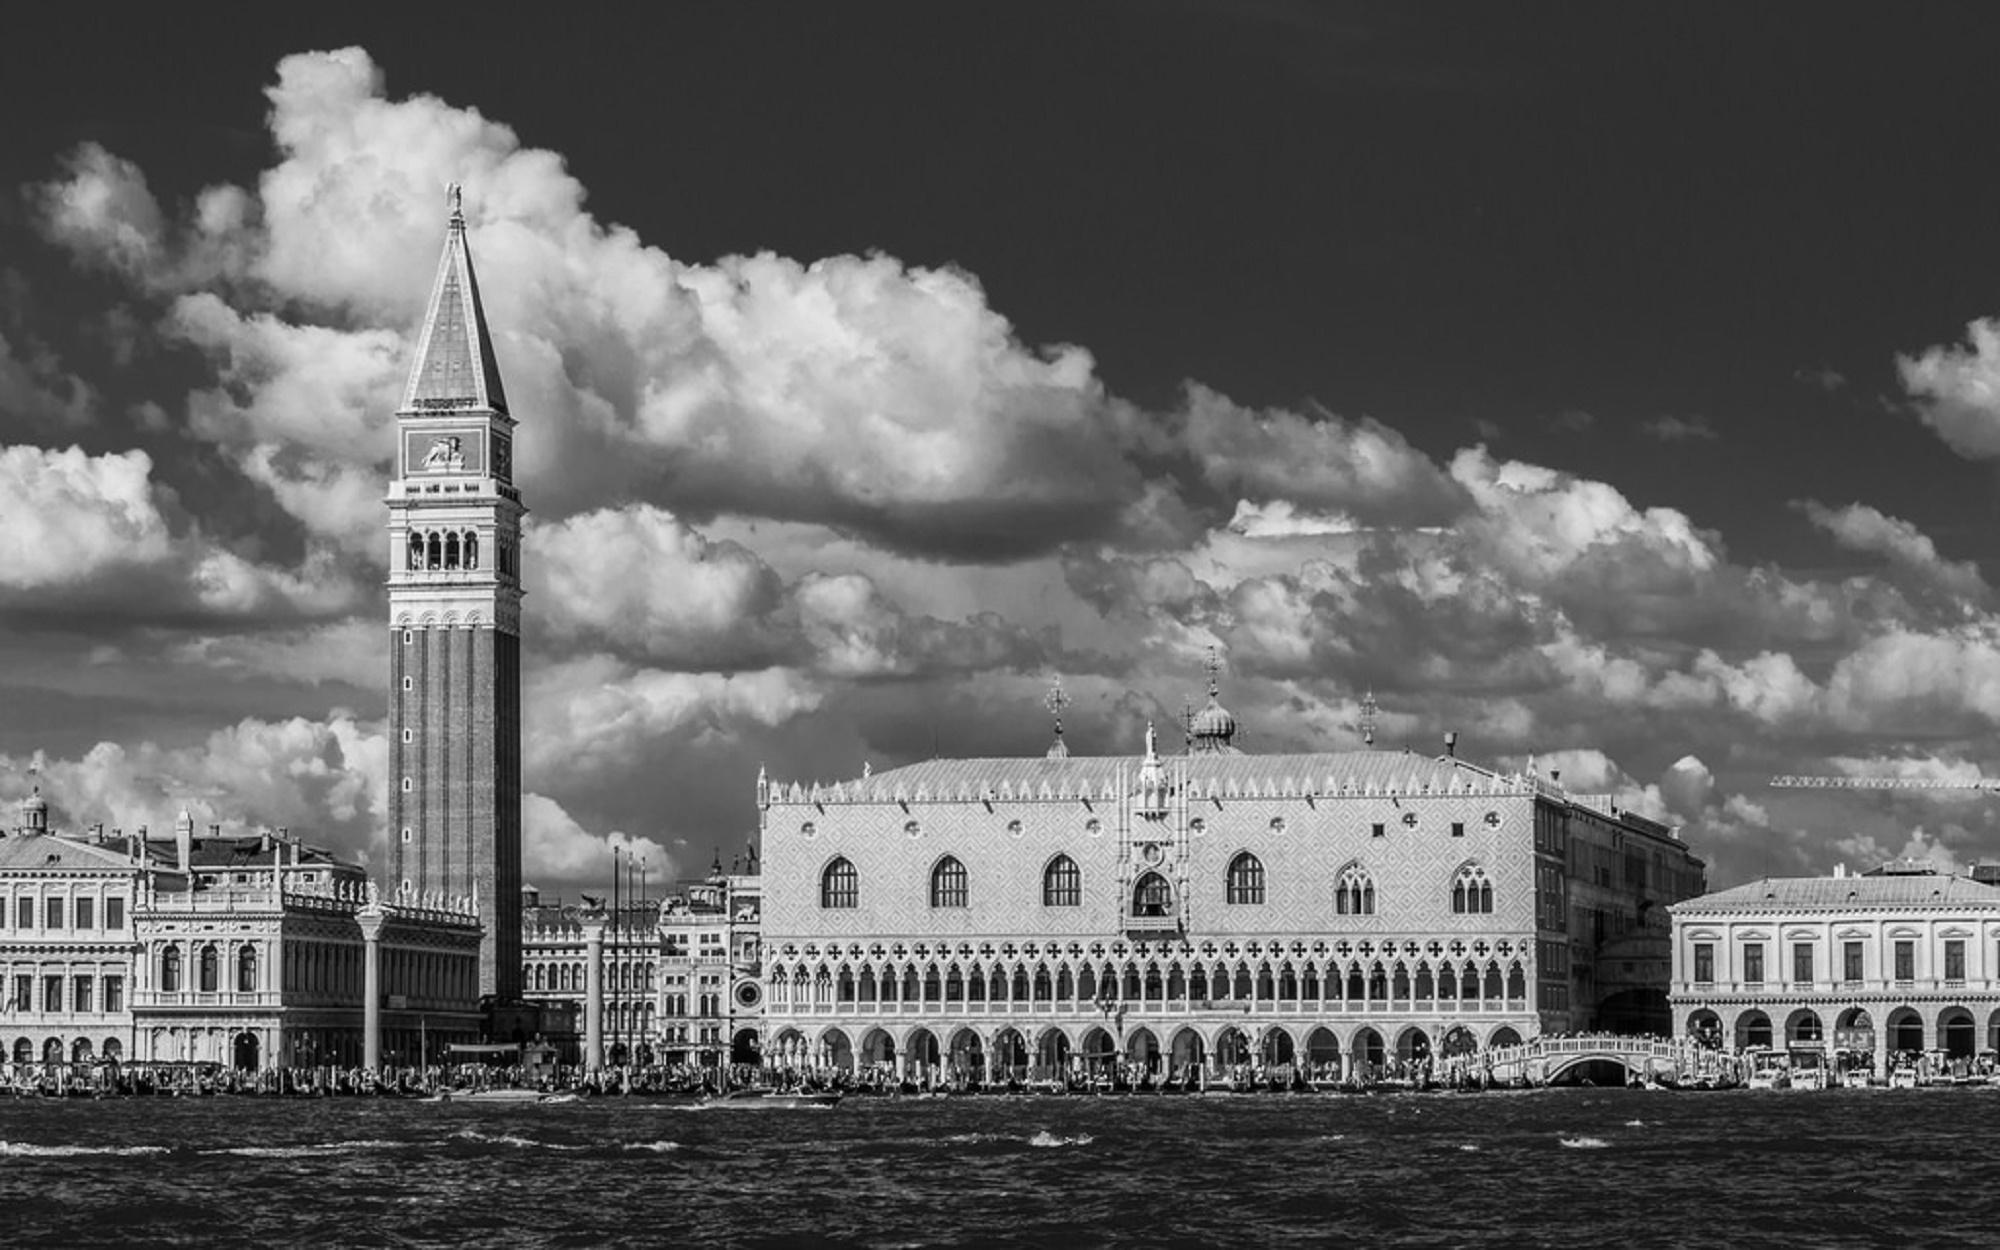 venetian doge's palace